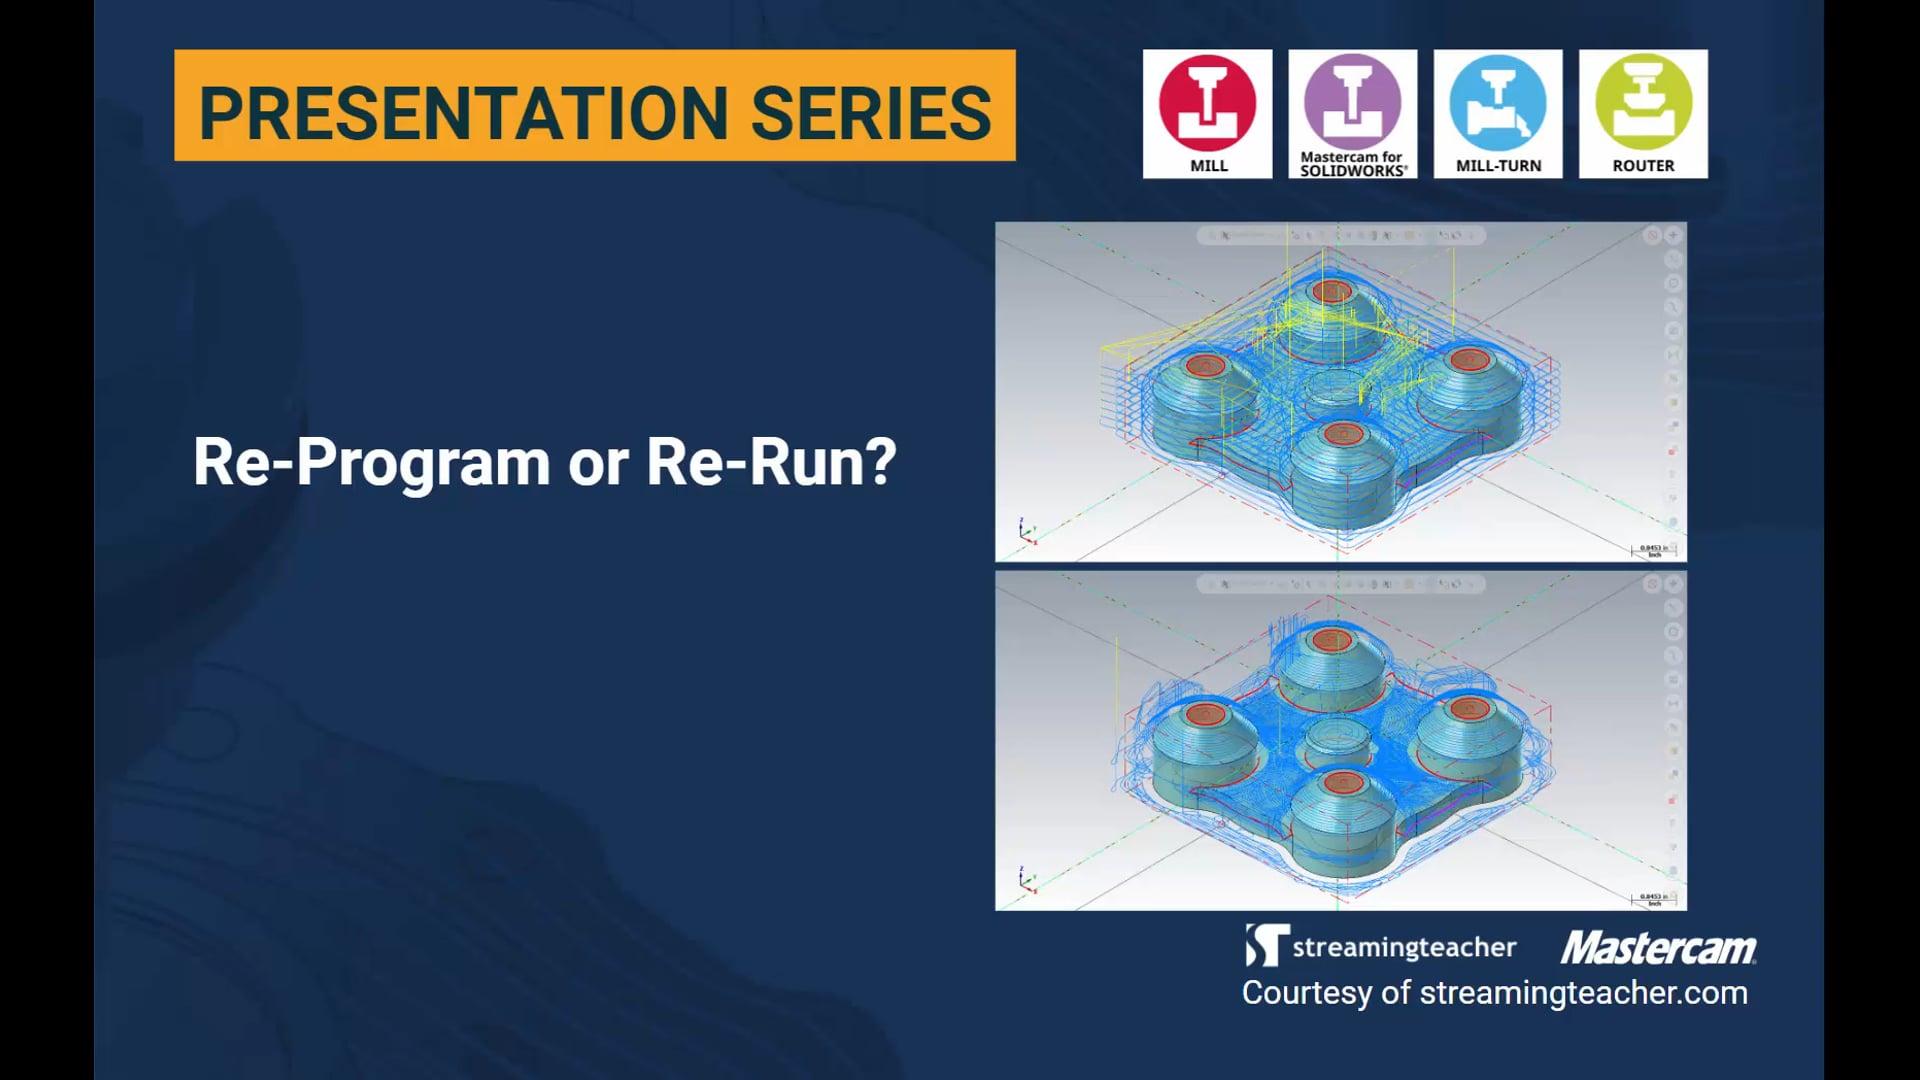 Re-Program or Re-Run?